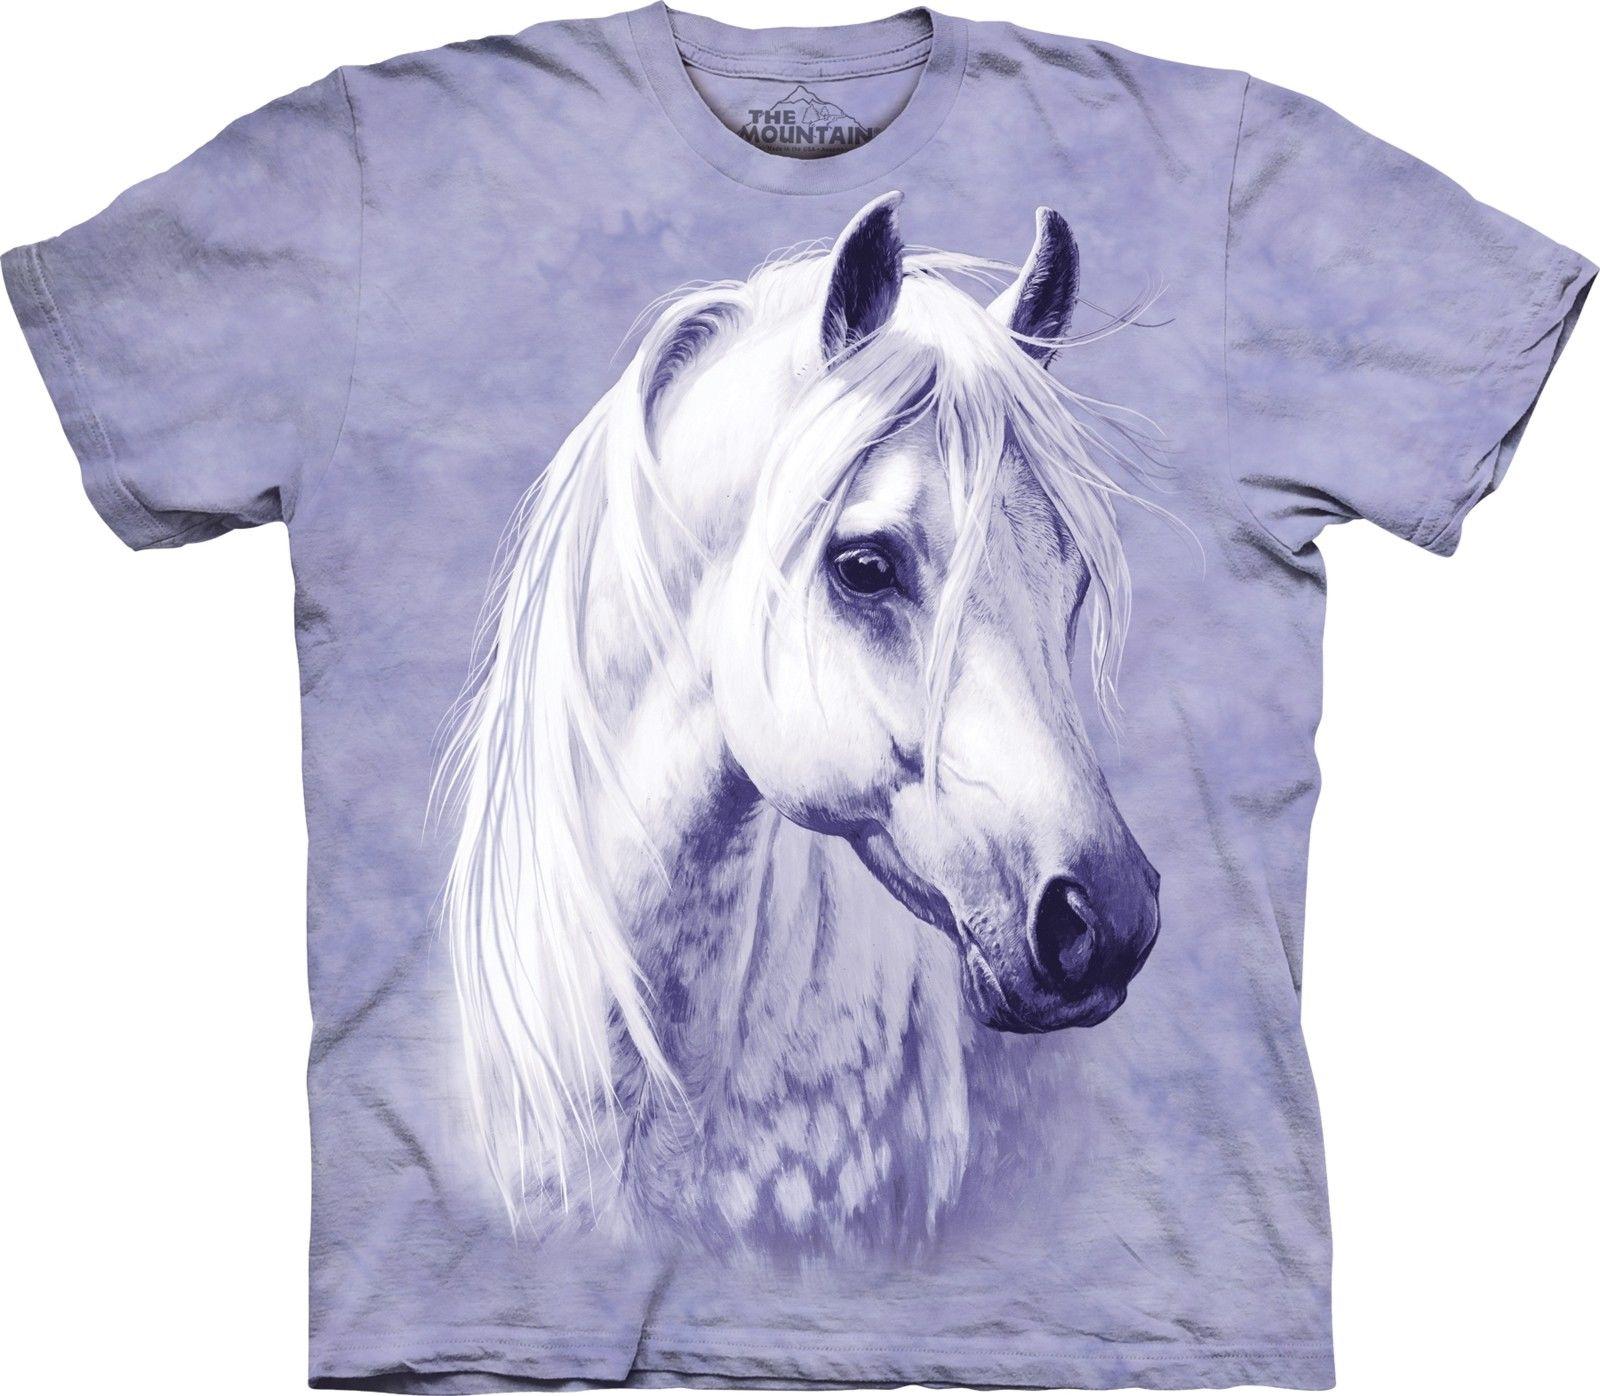 The Mountain Moonshadow Short Sleeve Arabian White Horse Adult T-Shirt (Sm - 3x)